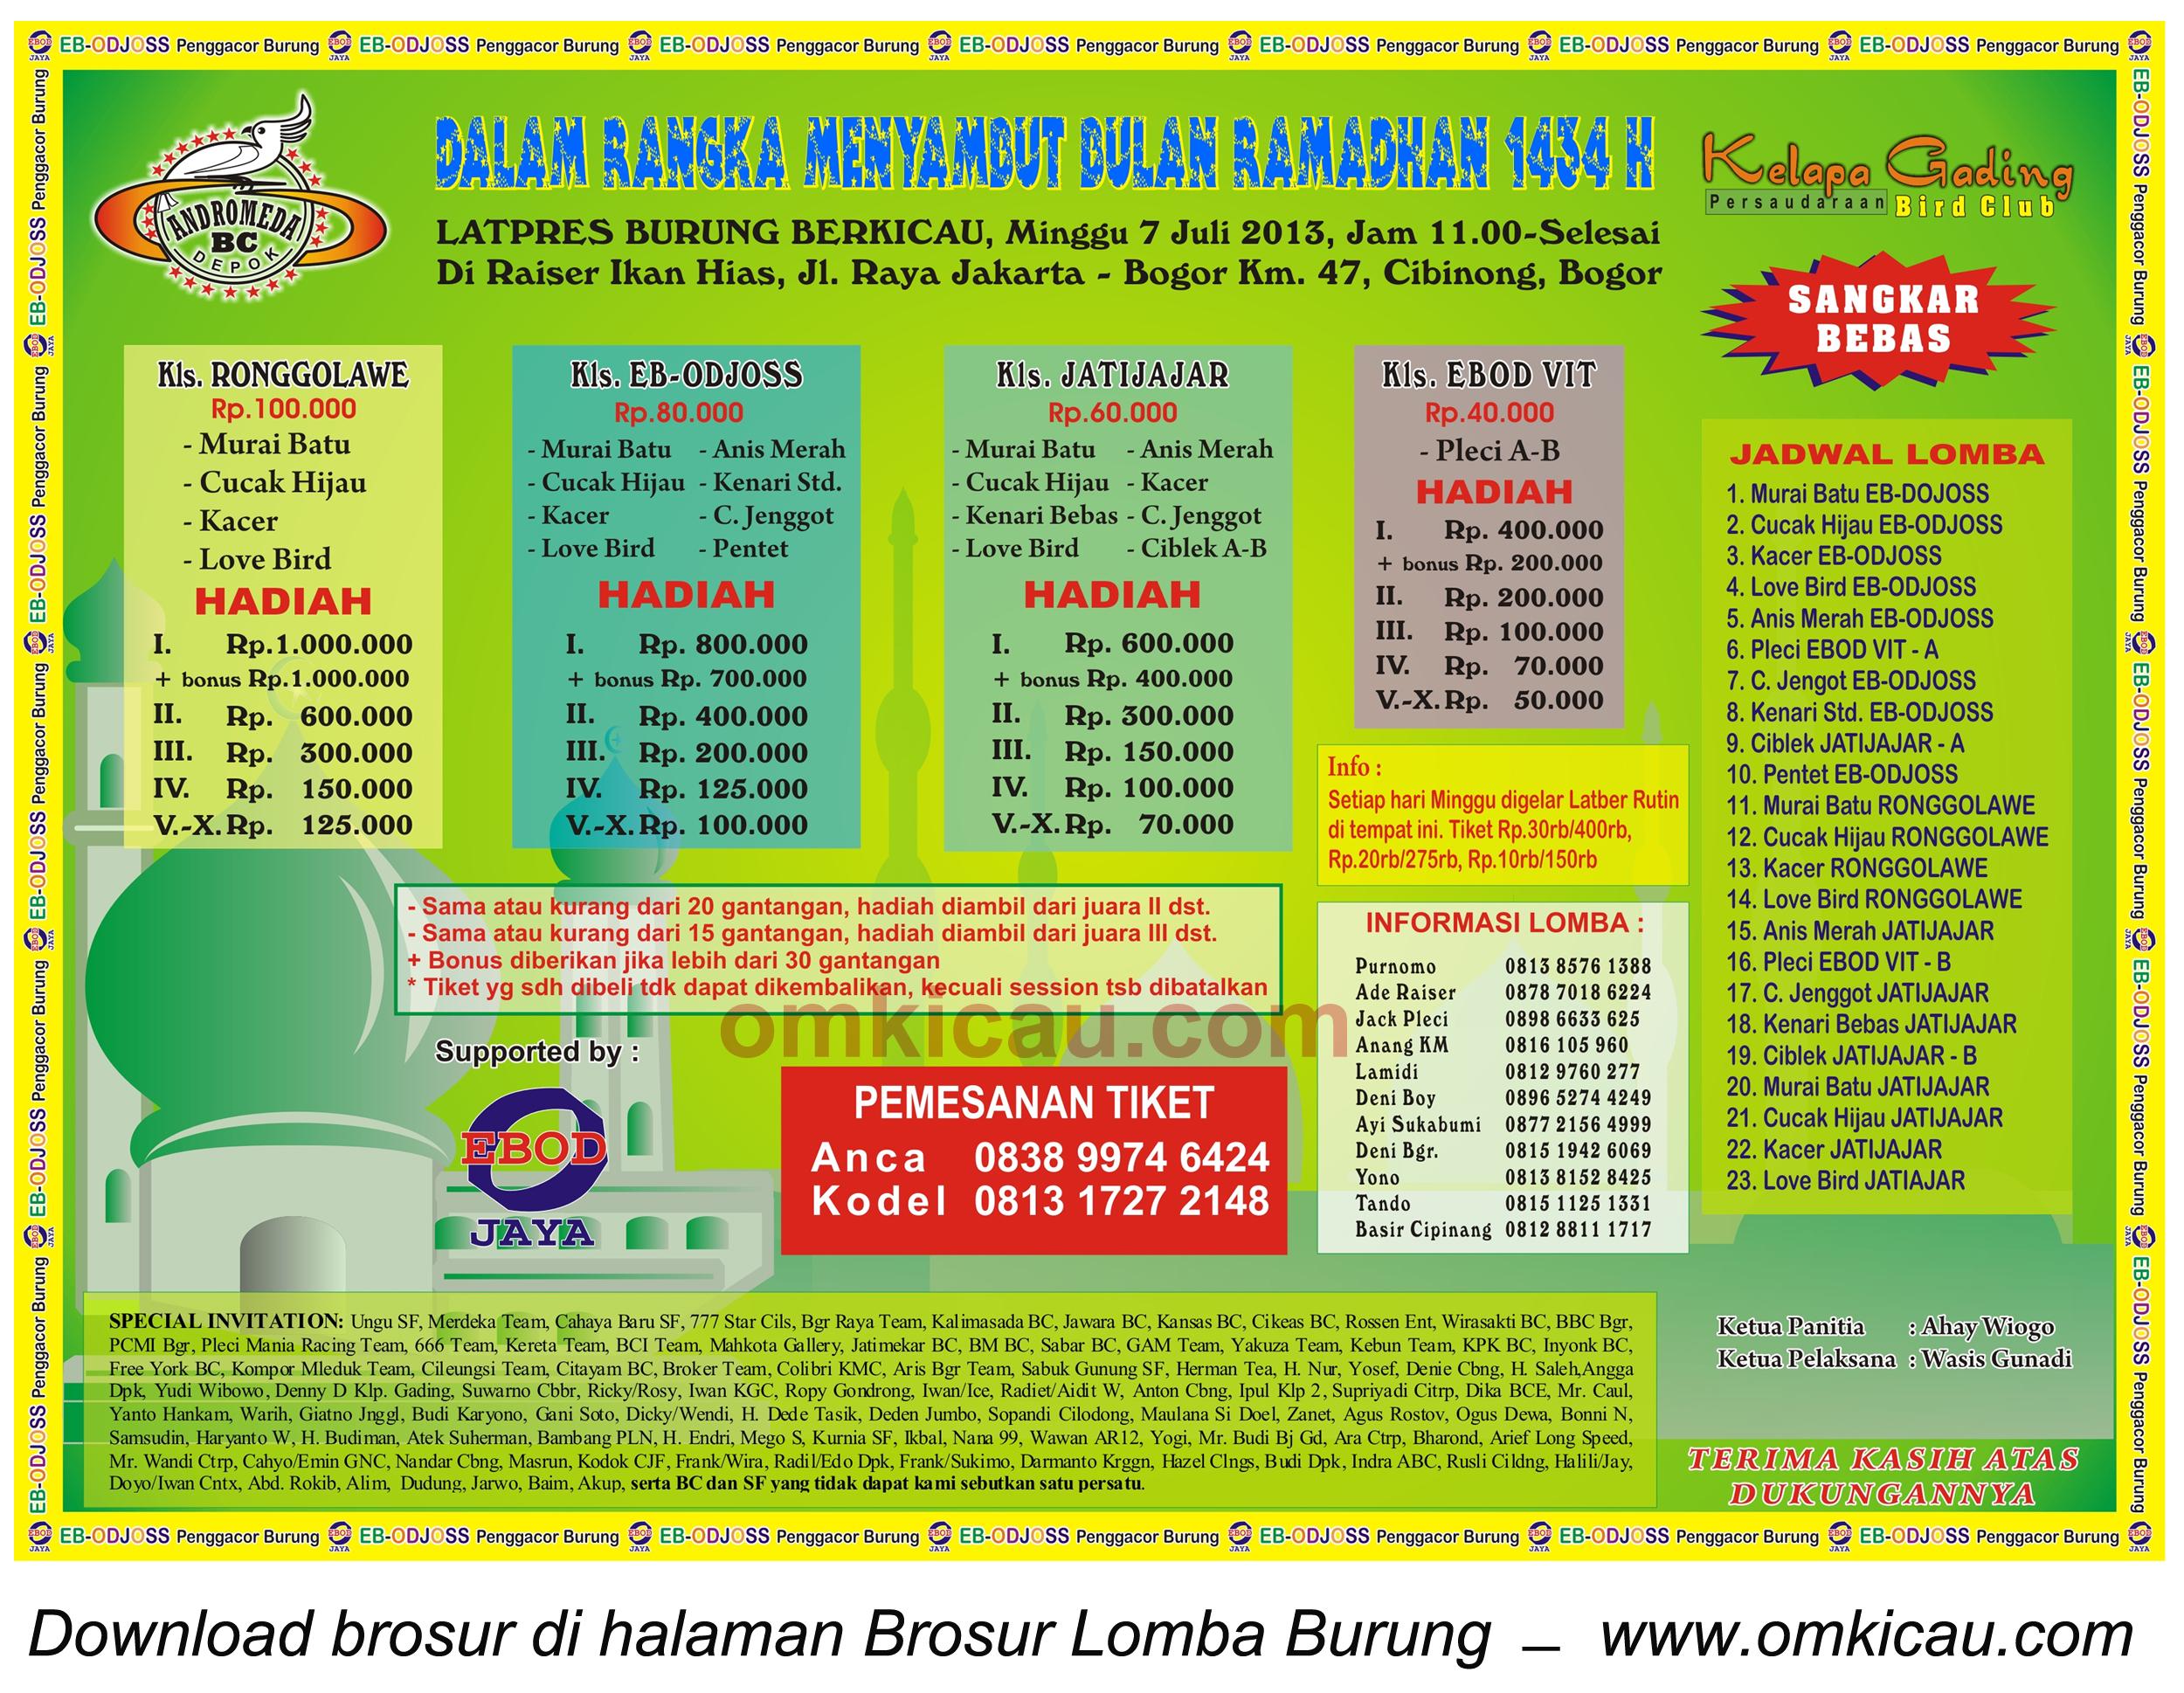 Brosur Latpres Burung Berkicau, Cibinong-Bogor, 7 Juli 2013